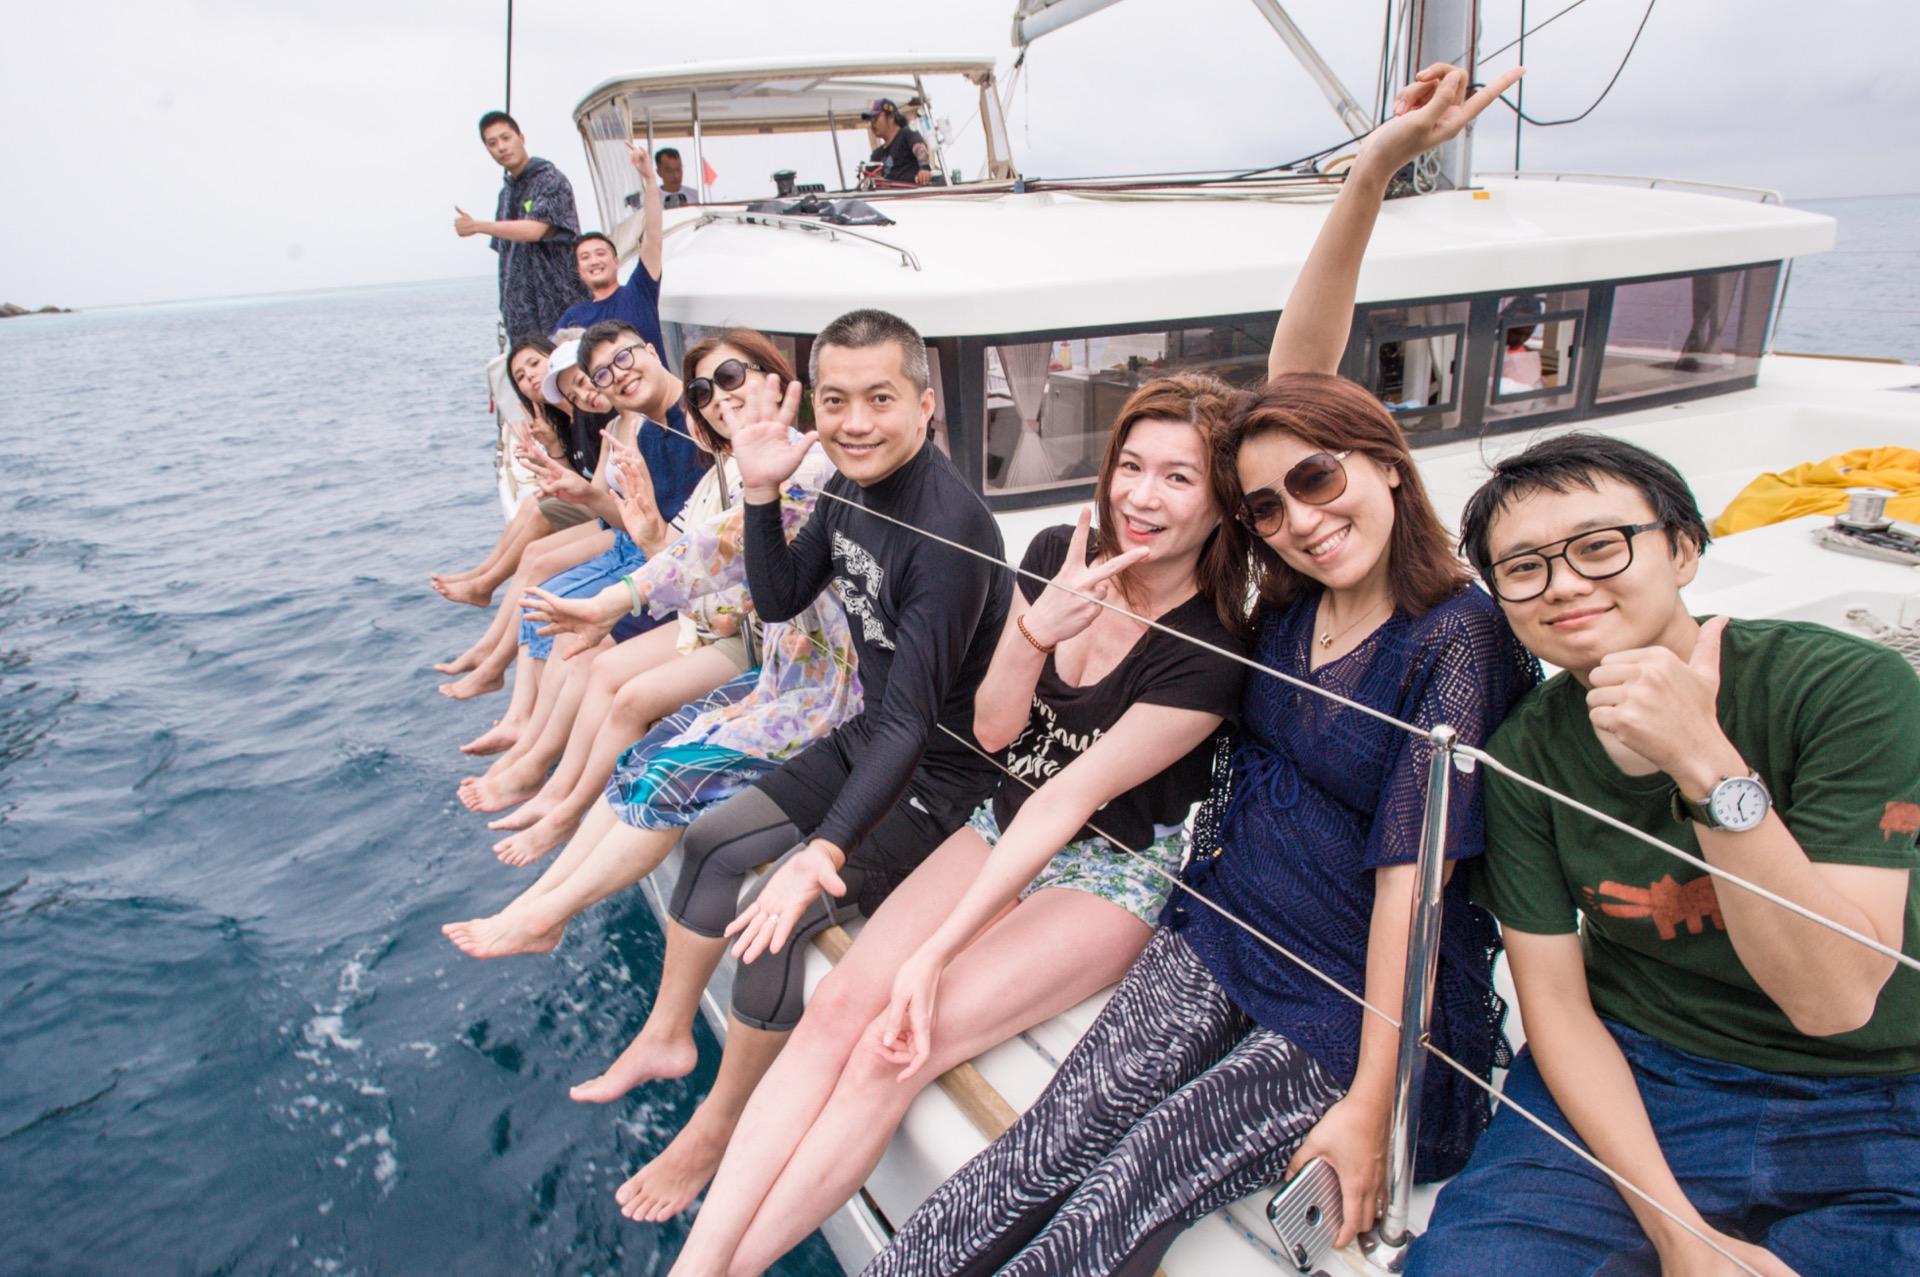 德築-DEZU-project-Fun3sport-lagoon-sailboat-ocean-15